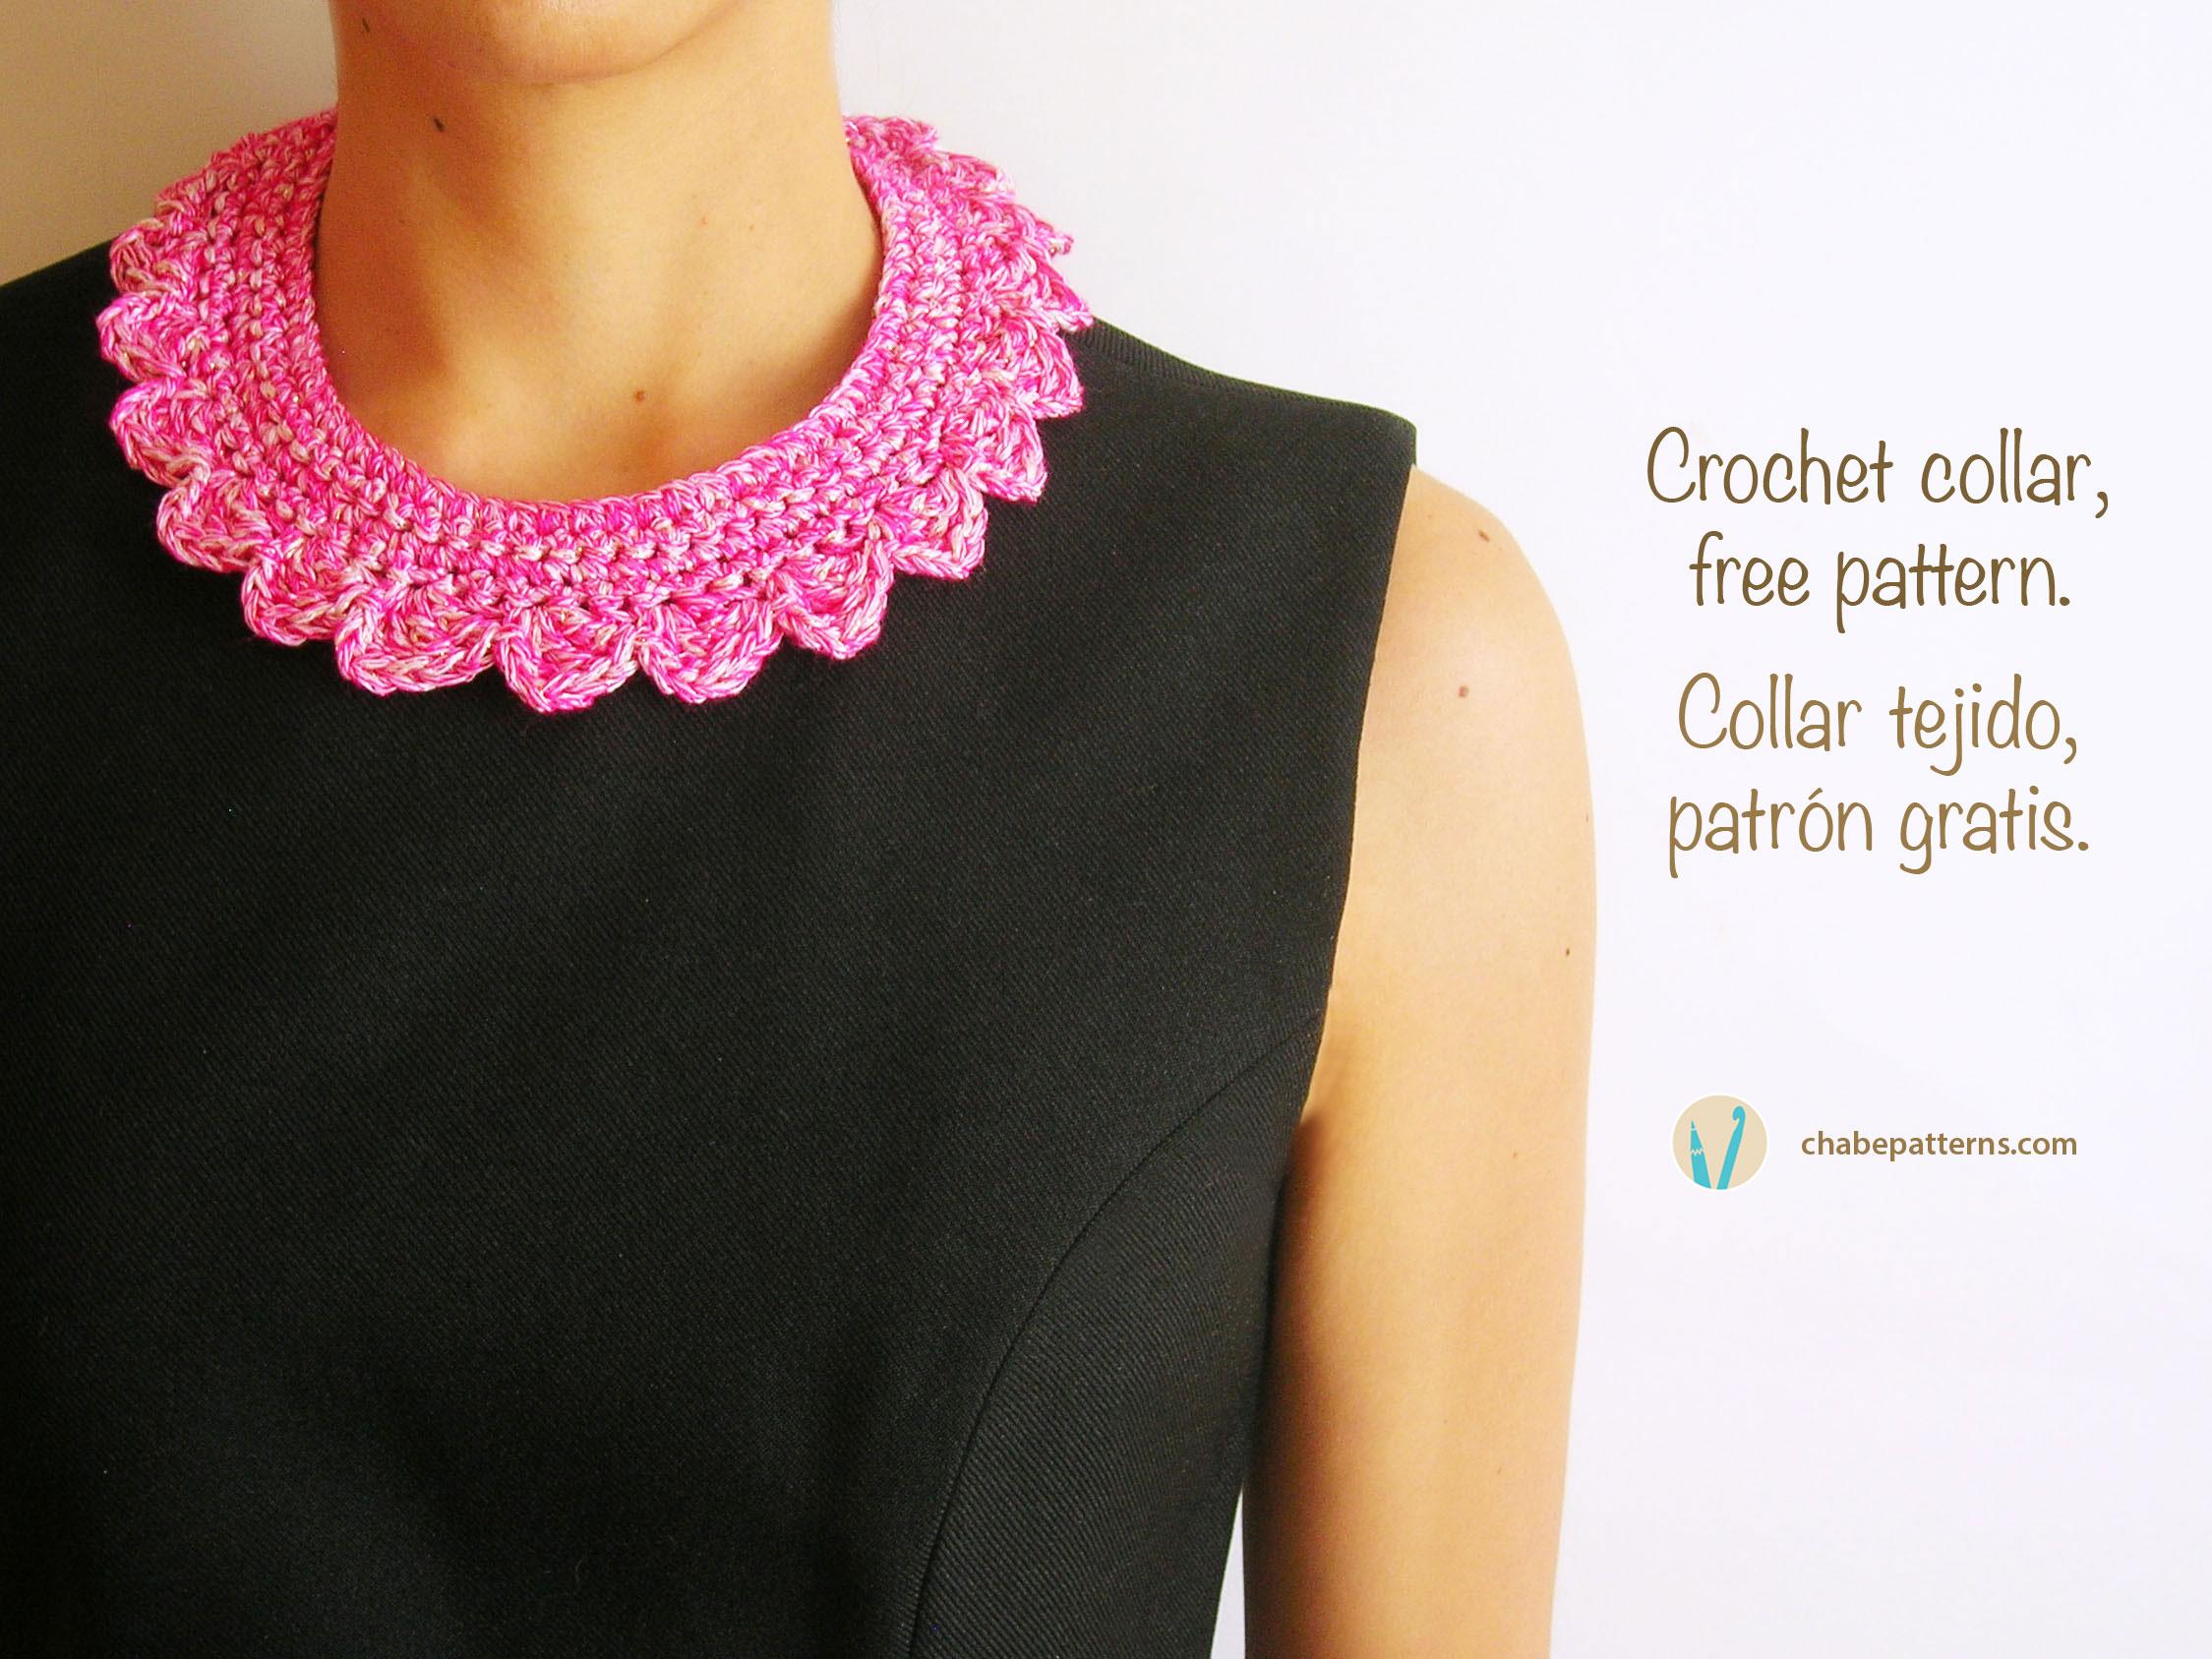 Crochet collar/ Collar tejido | Chabepatterns